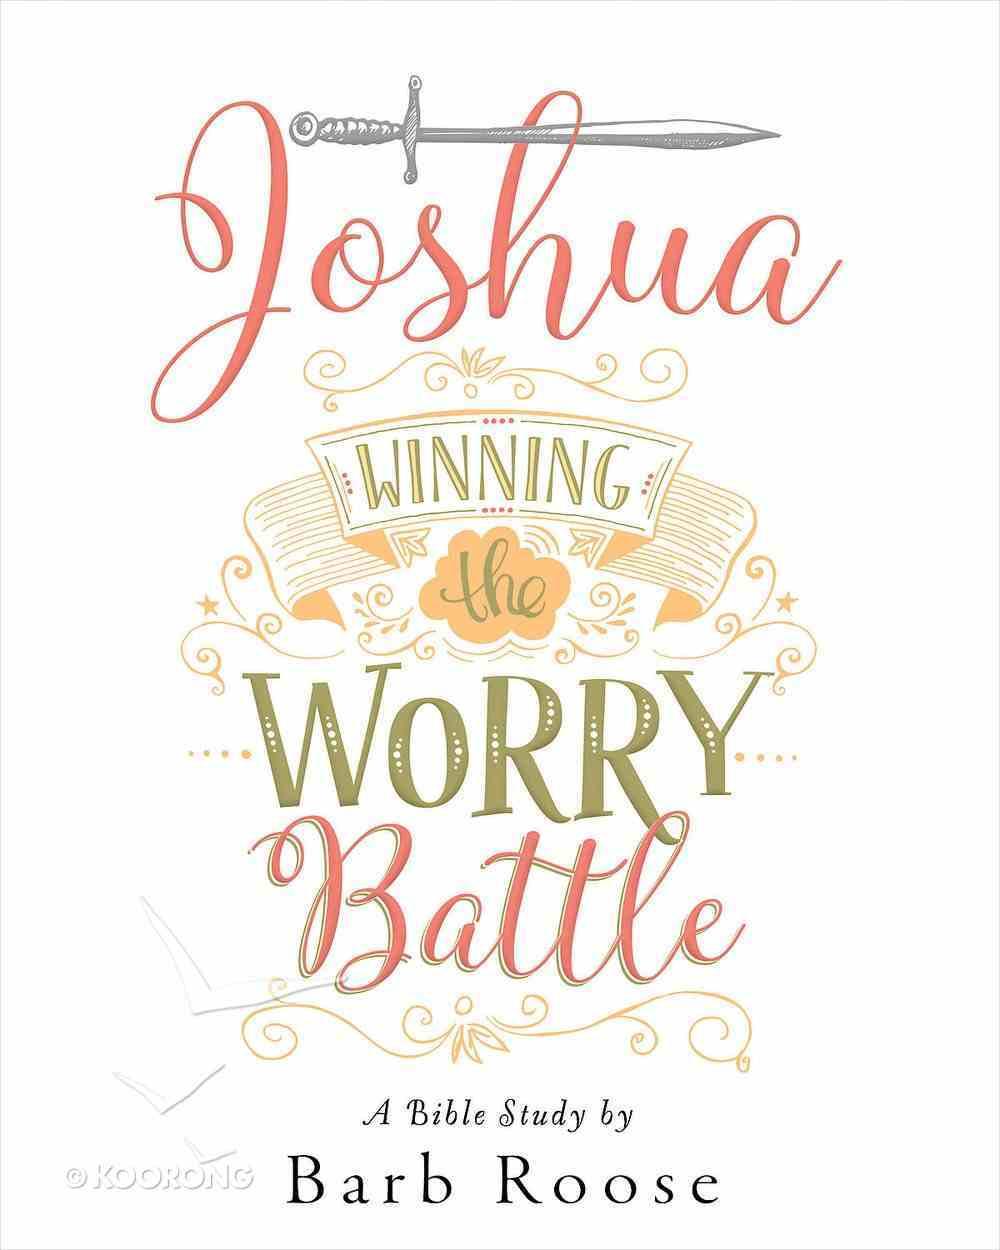 Joshua - Women's Bible Study: Winning the Worry Battle (Participant Workbook) eBook